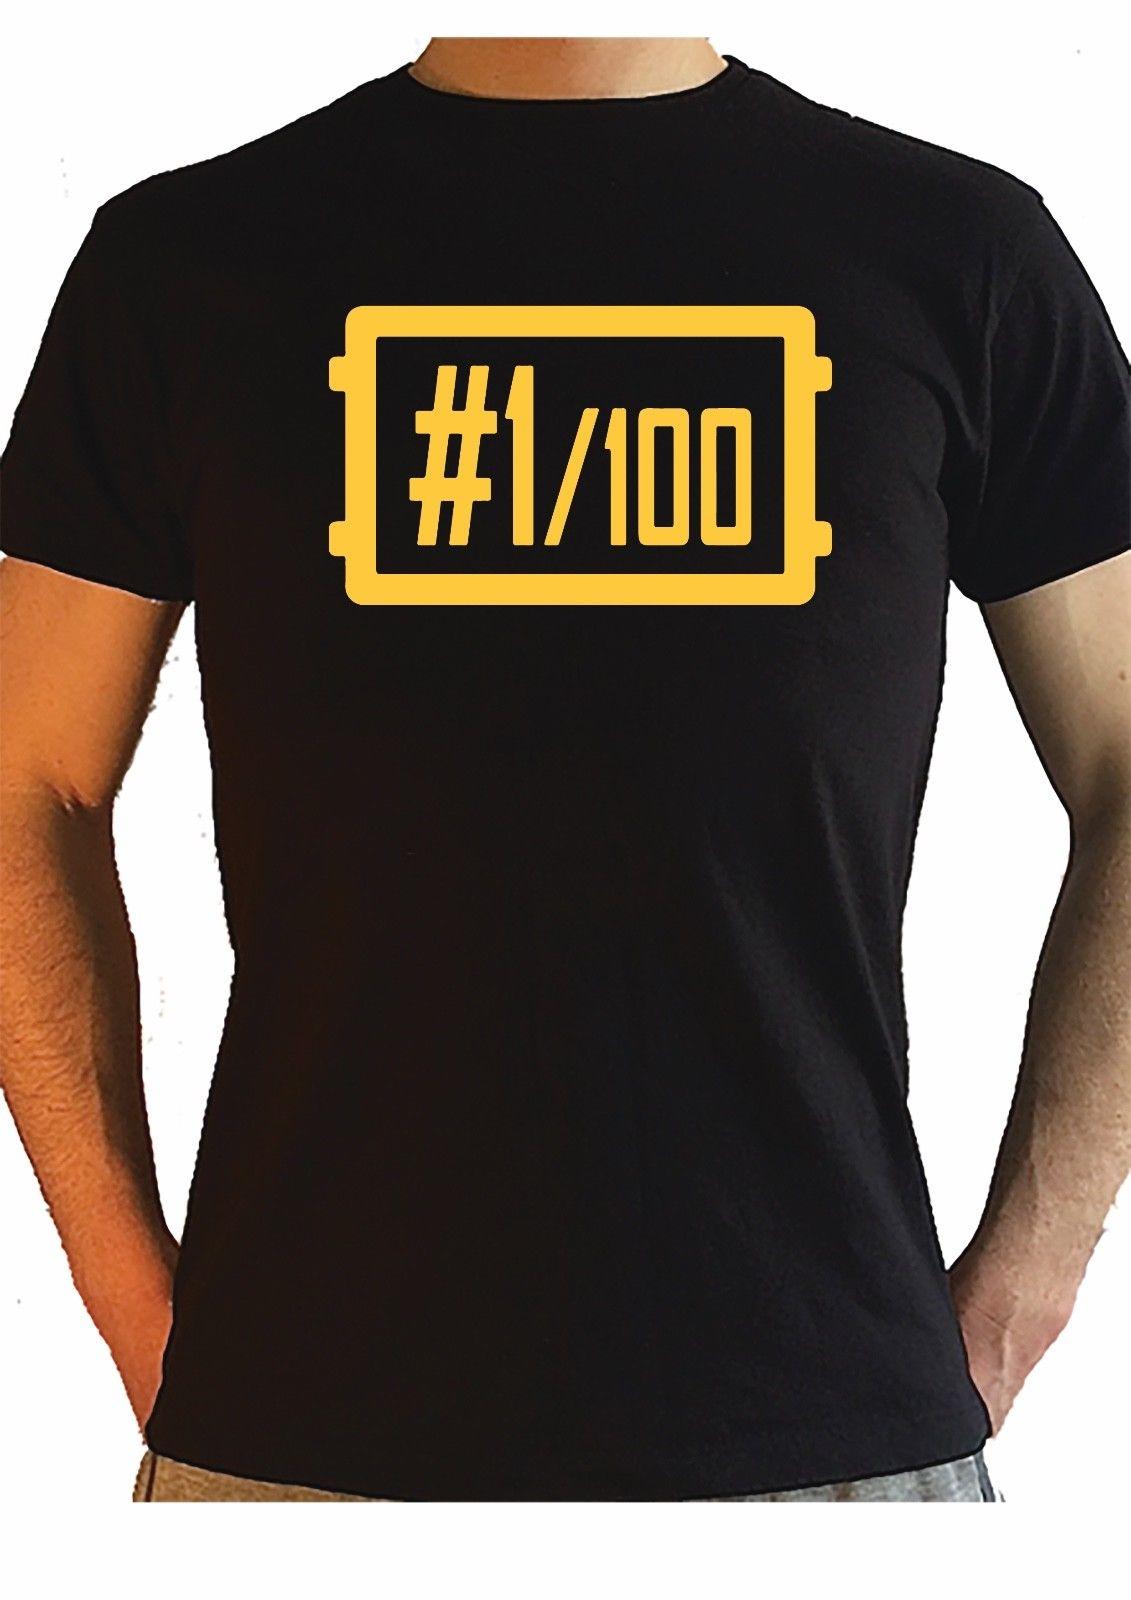 1d08e168af PUBG T Shirt Winner Winner Chicken Dinner Cartoon t shirt men Unisex New  Fashion tshirt free shipping top ajax 2018 funny